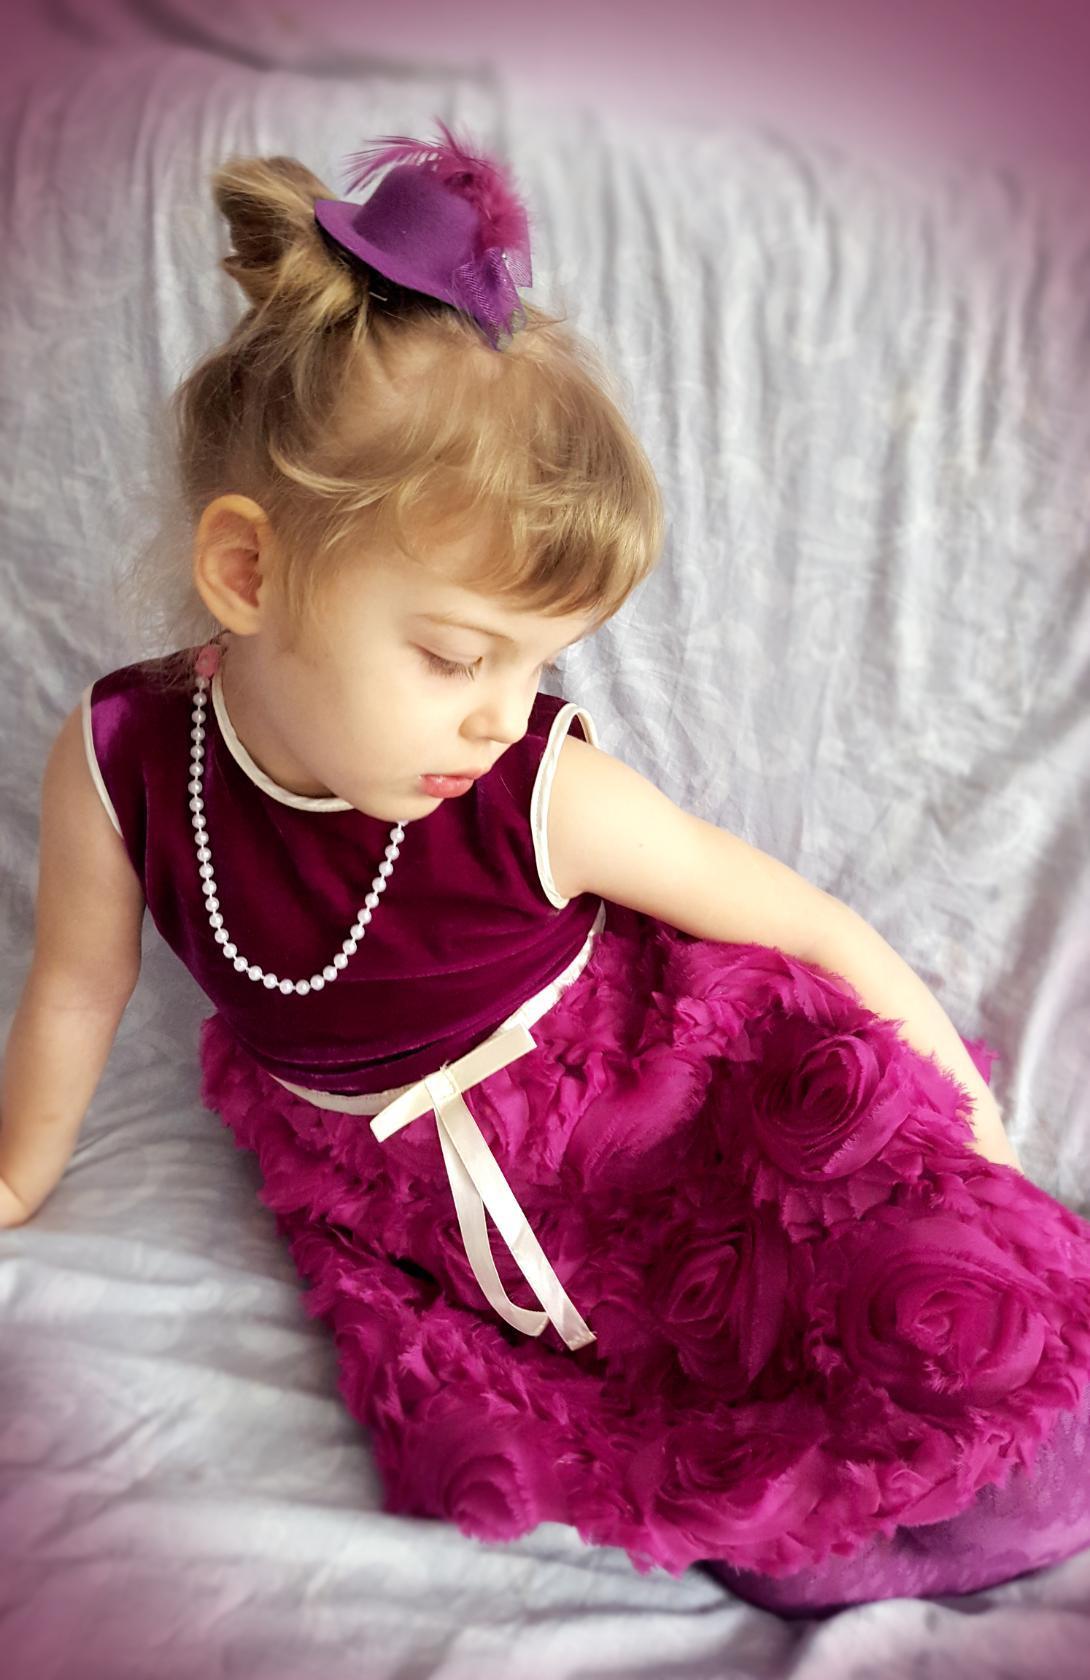 Принцесса . Принцесса собирается на бал